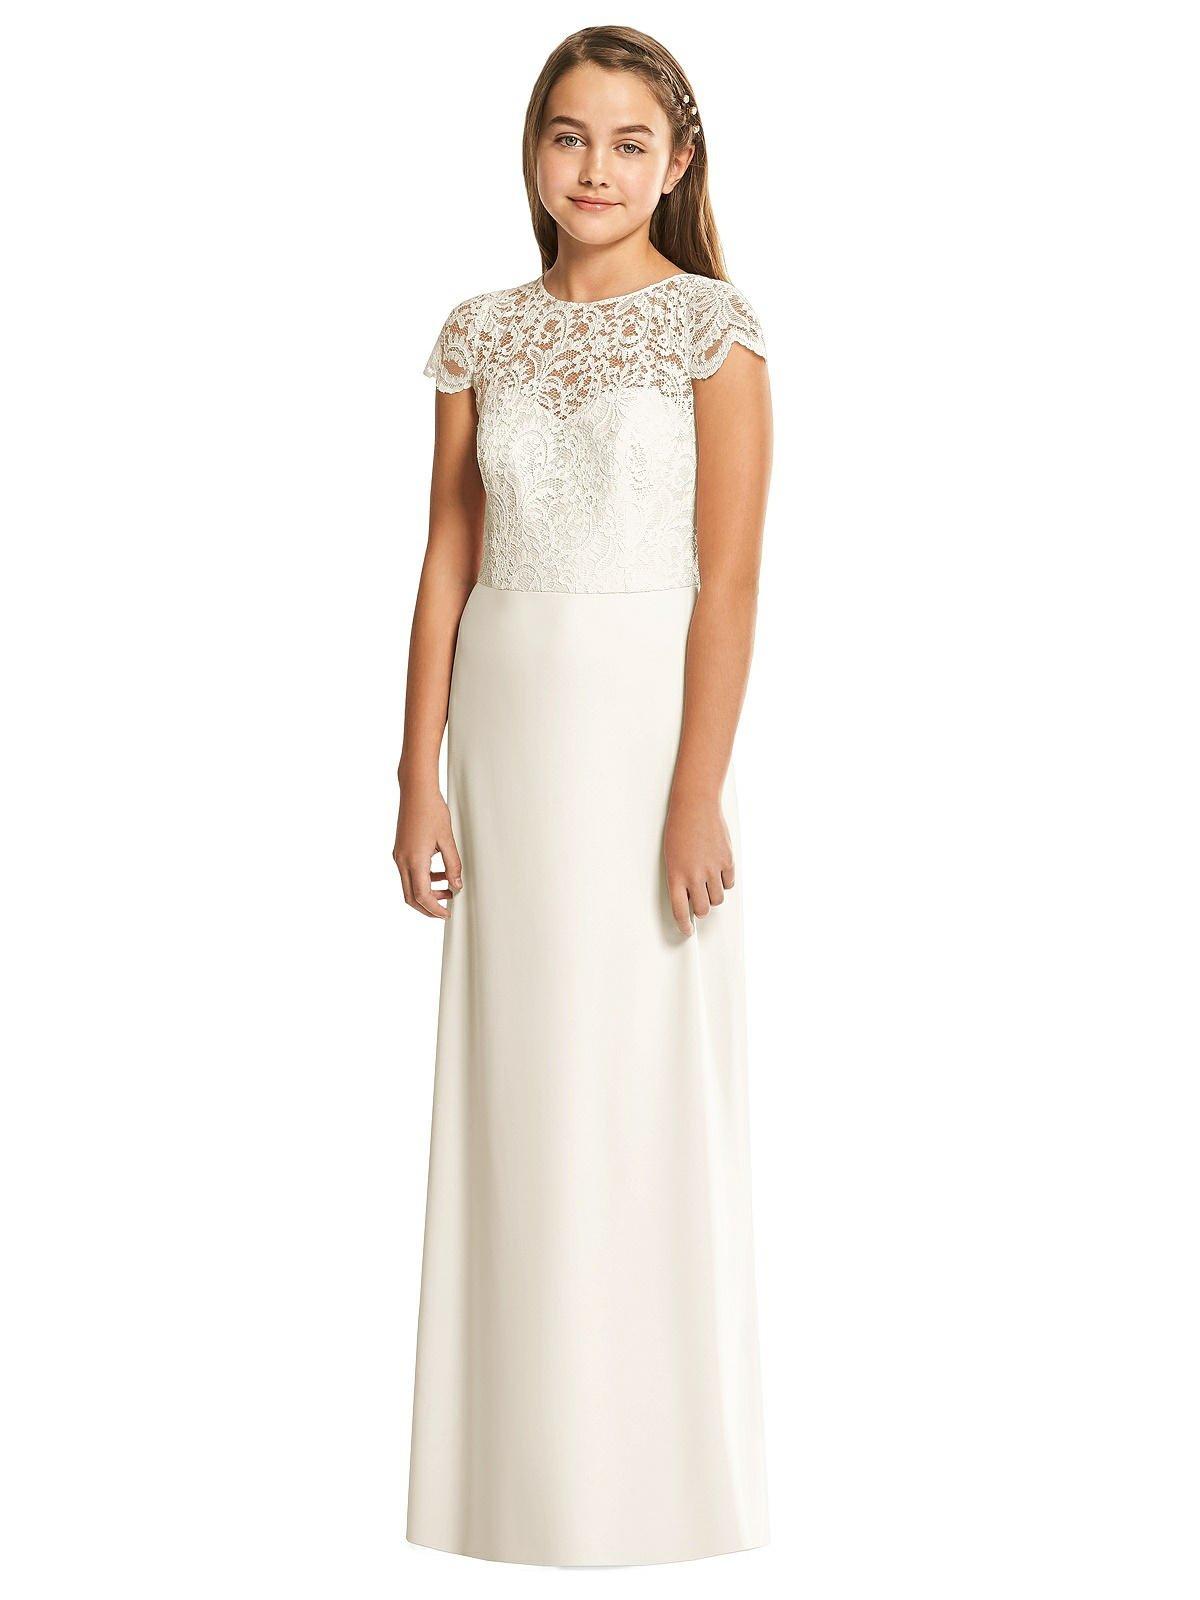 Ivory Marquis Lace Junior Bridesmaids Dress